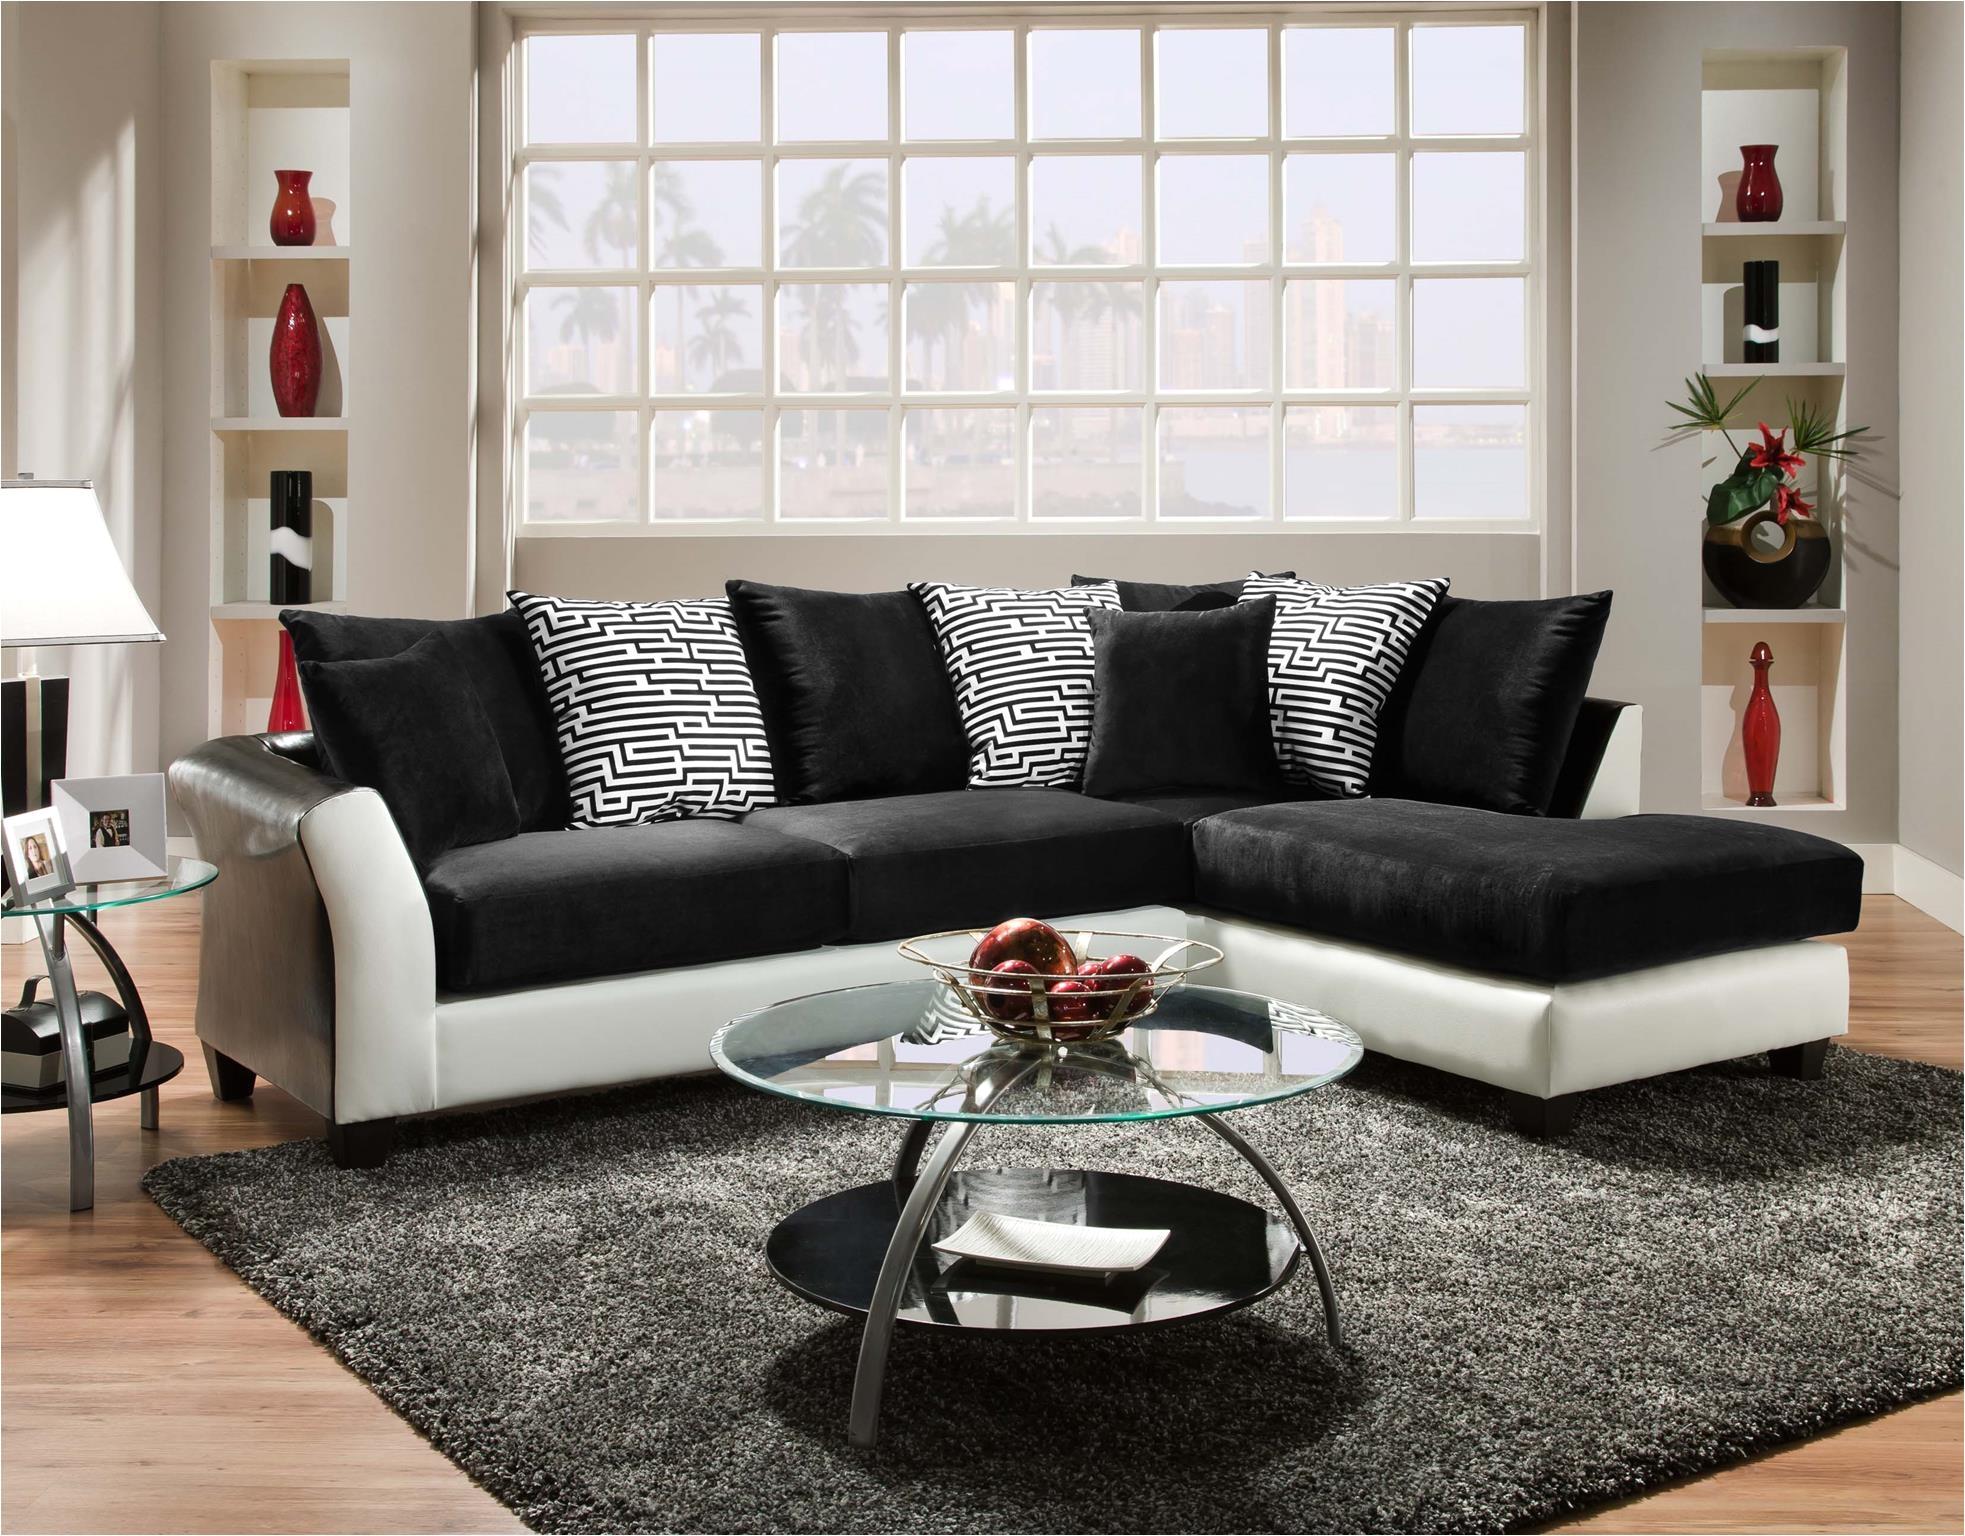 orland park furniture furniture stores naperville il avanti furniture